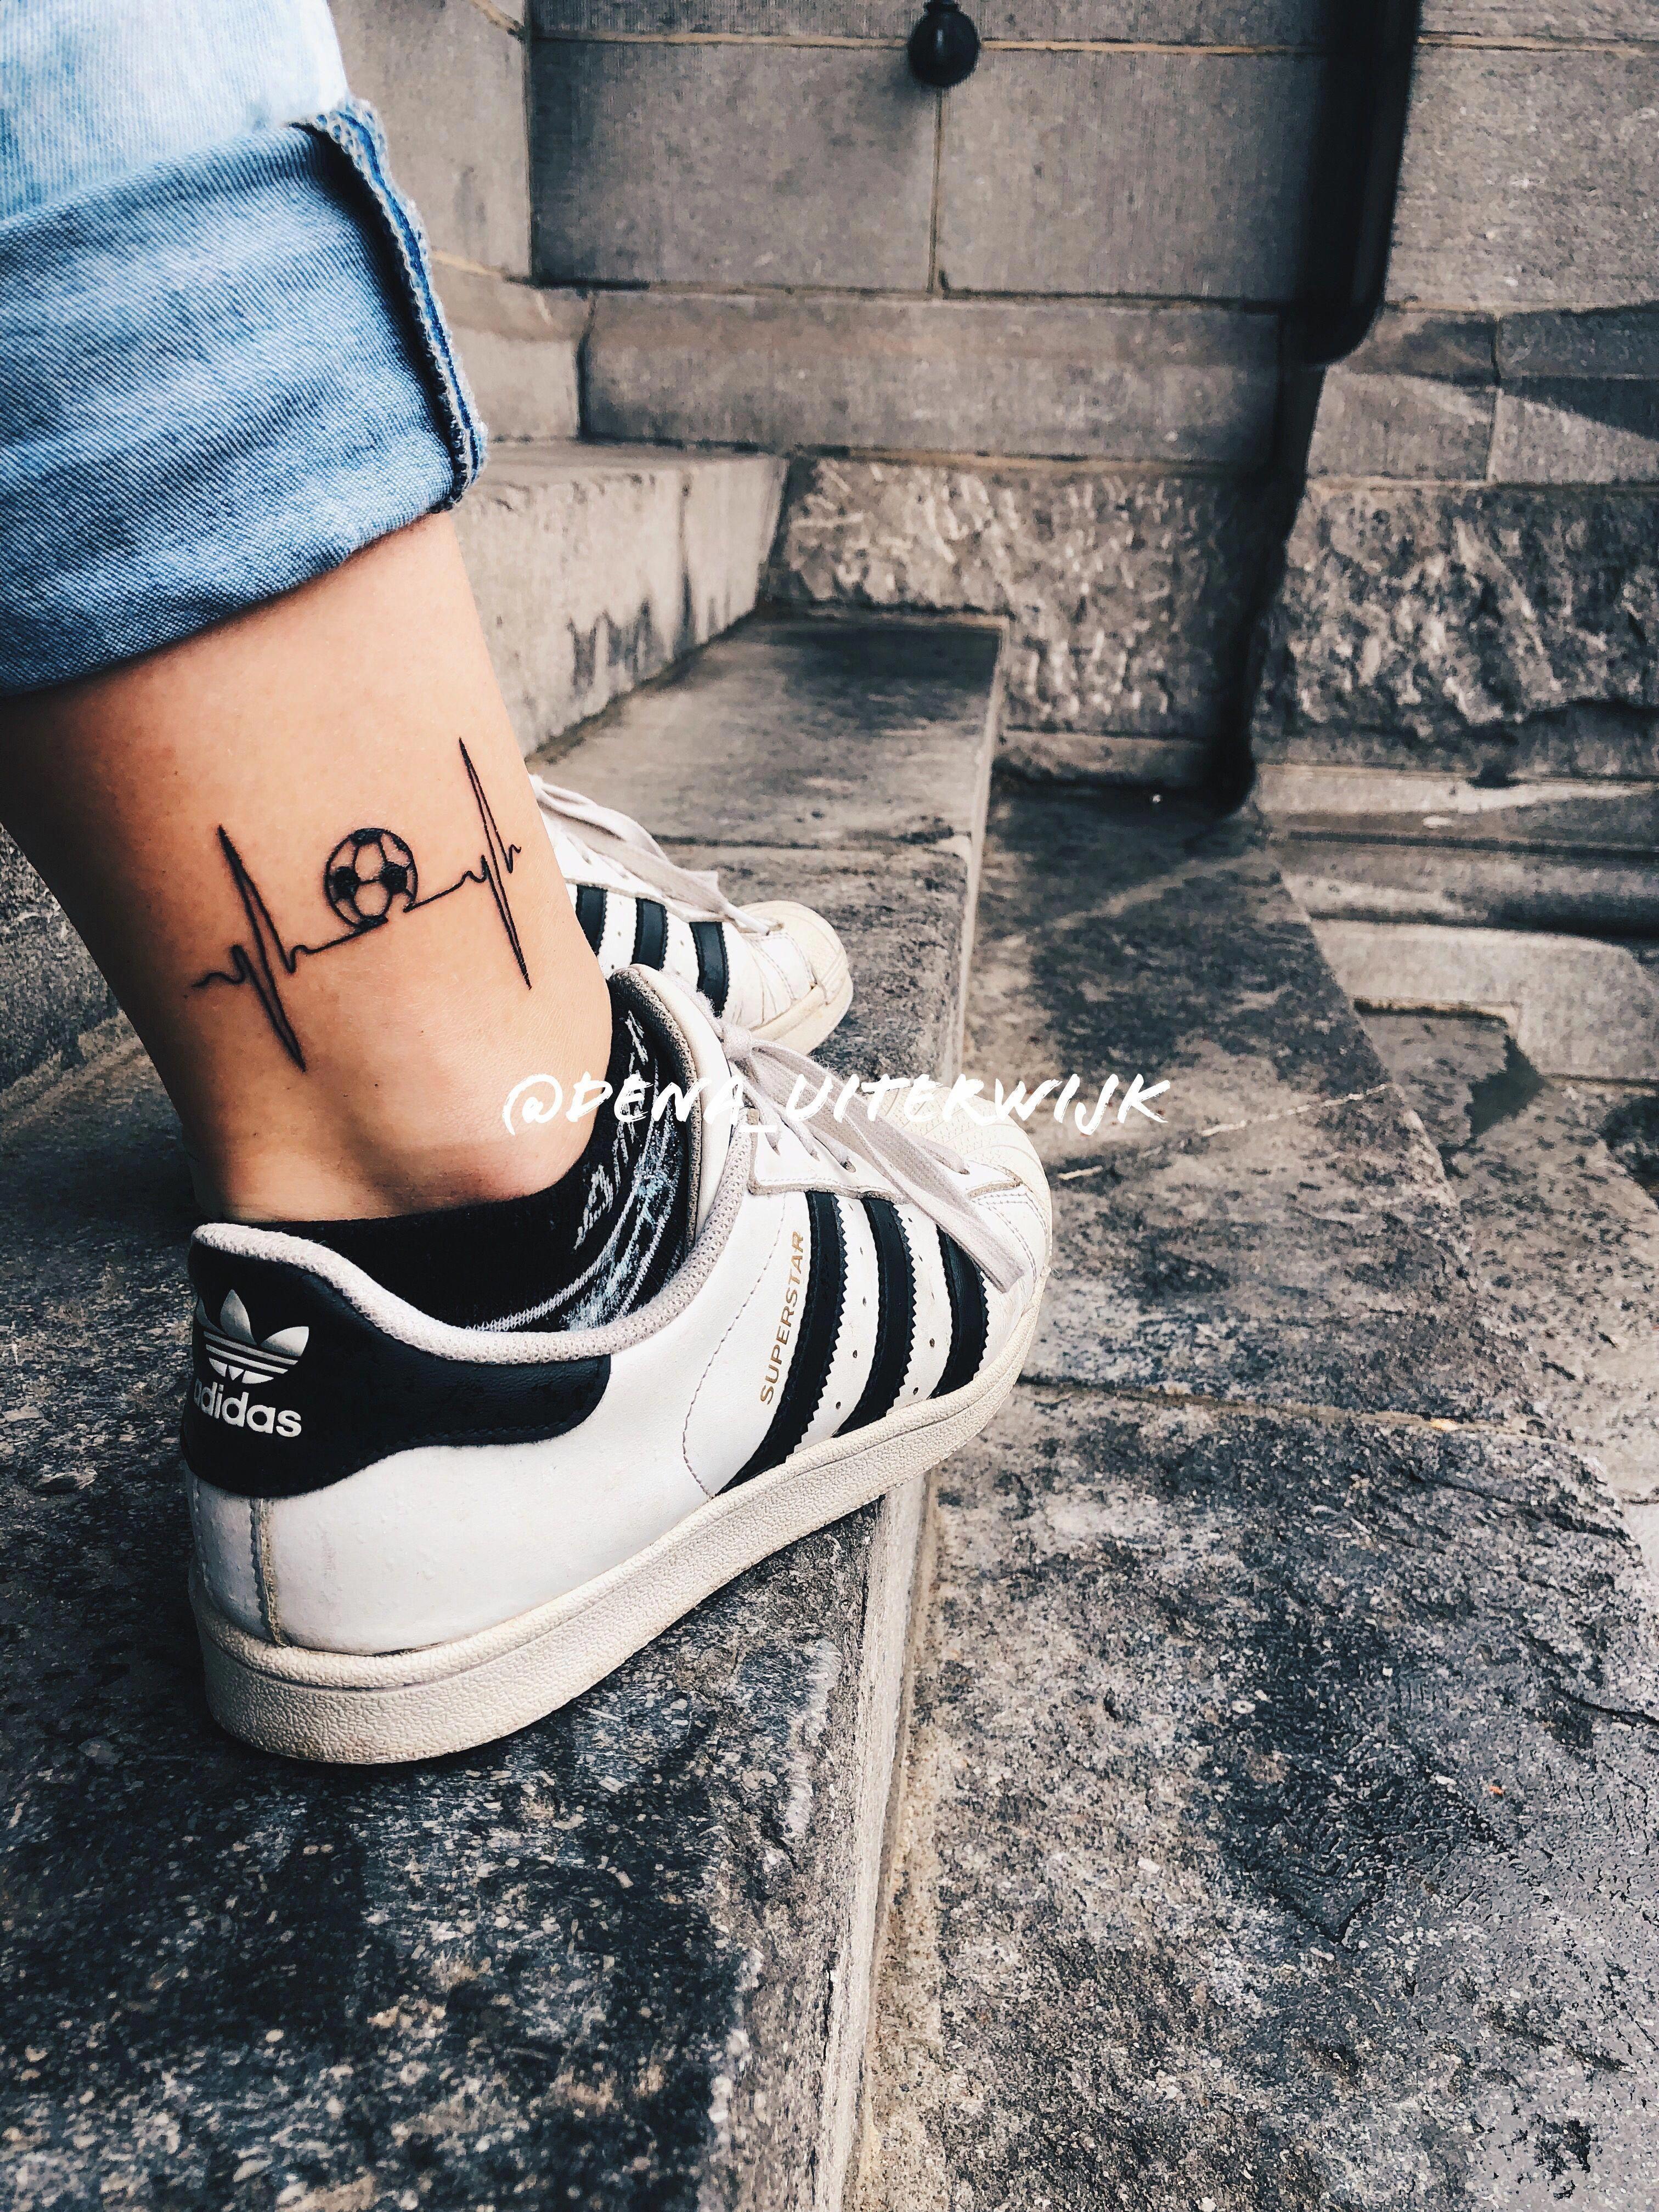 Tattoos Heartbeat Soccer Soccergirl Tattoodesigns Netherlands Dena Uiterwijk Tatuagem De Futebol Tatuagem Sobre Futebol Tatuagen Religiosa